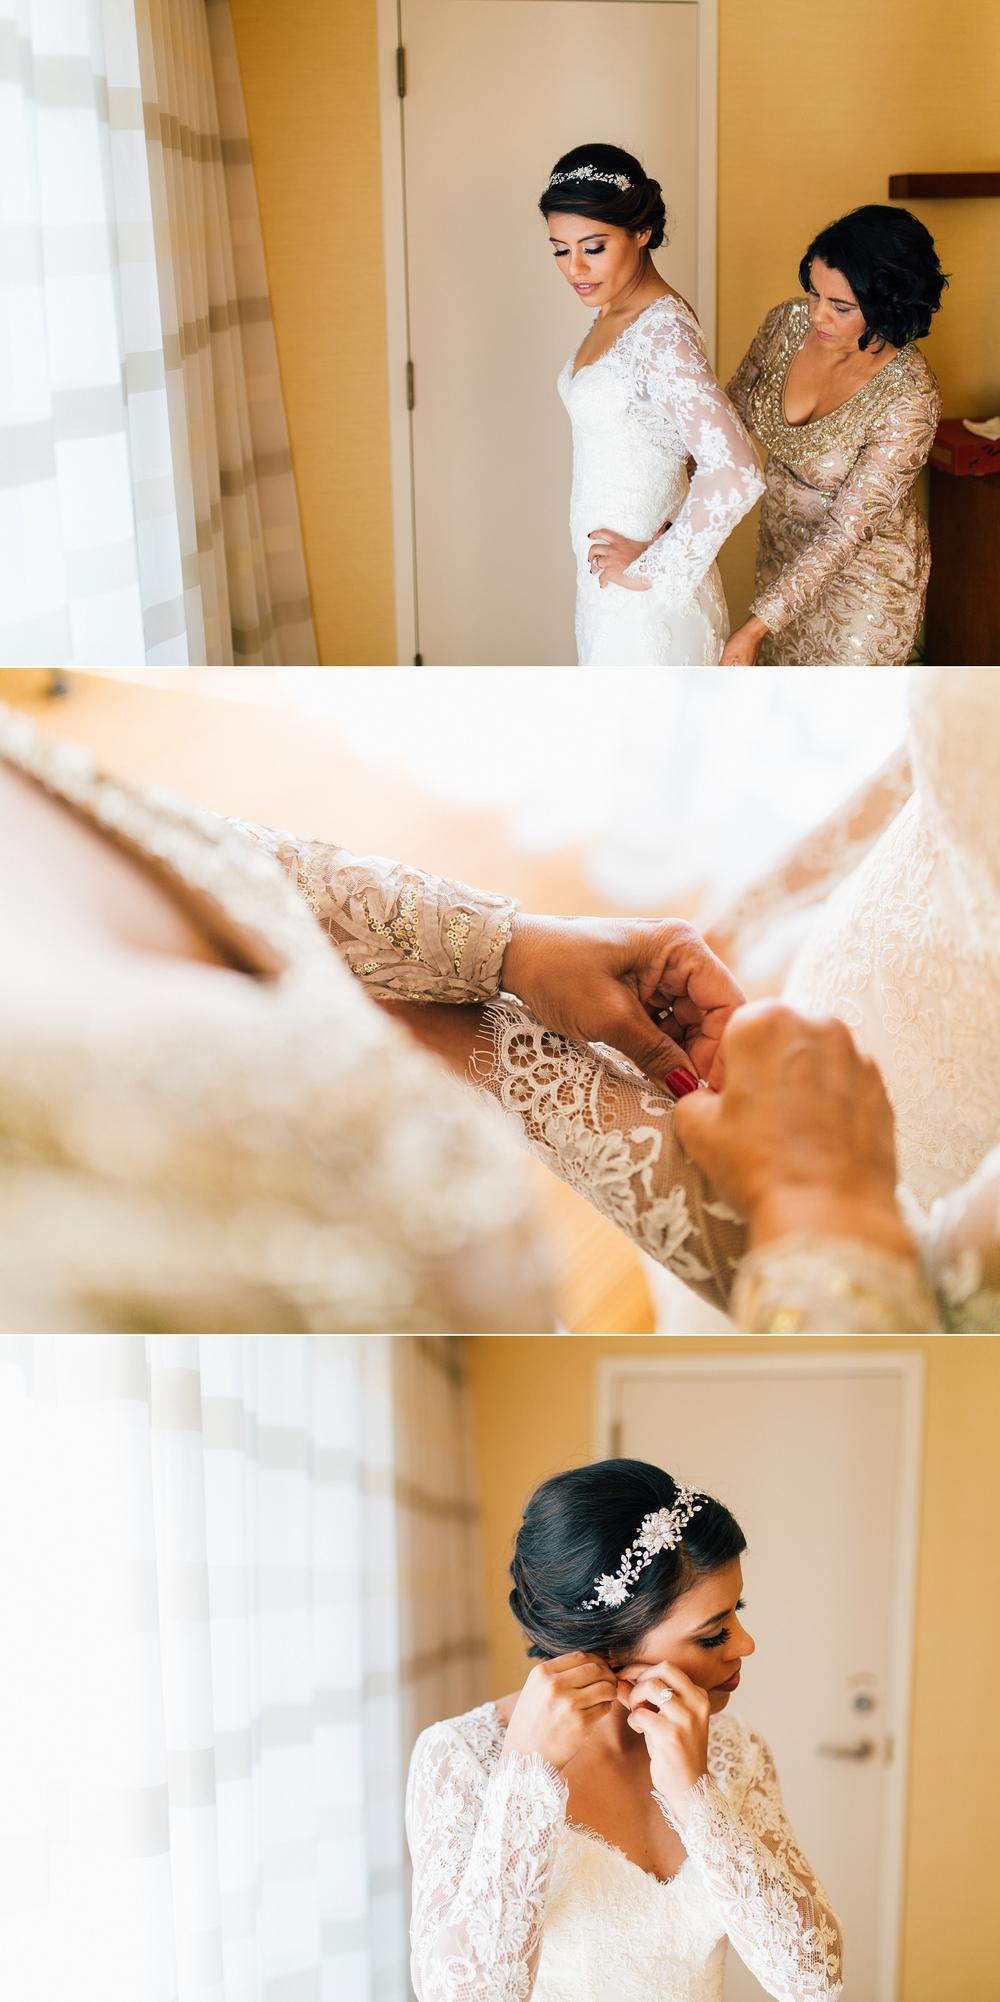 ashley vos photography seattle area wedding photographer_0796.jpg